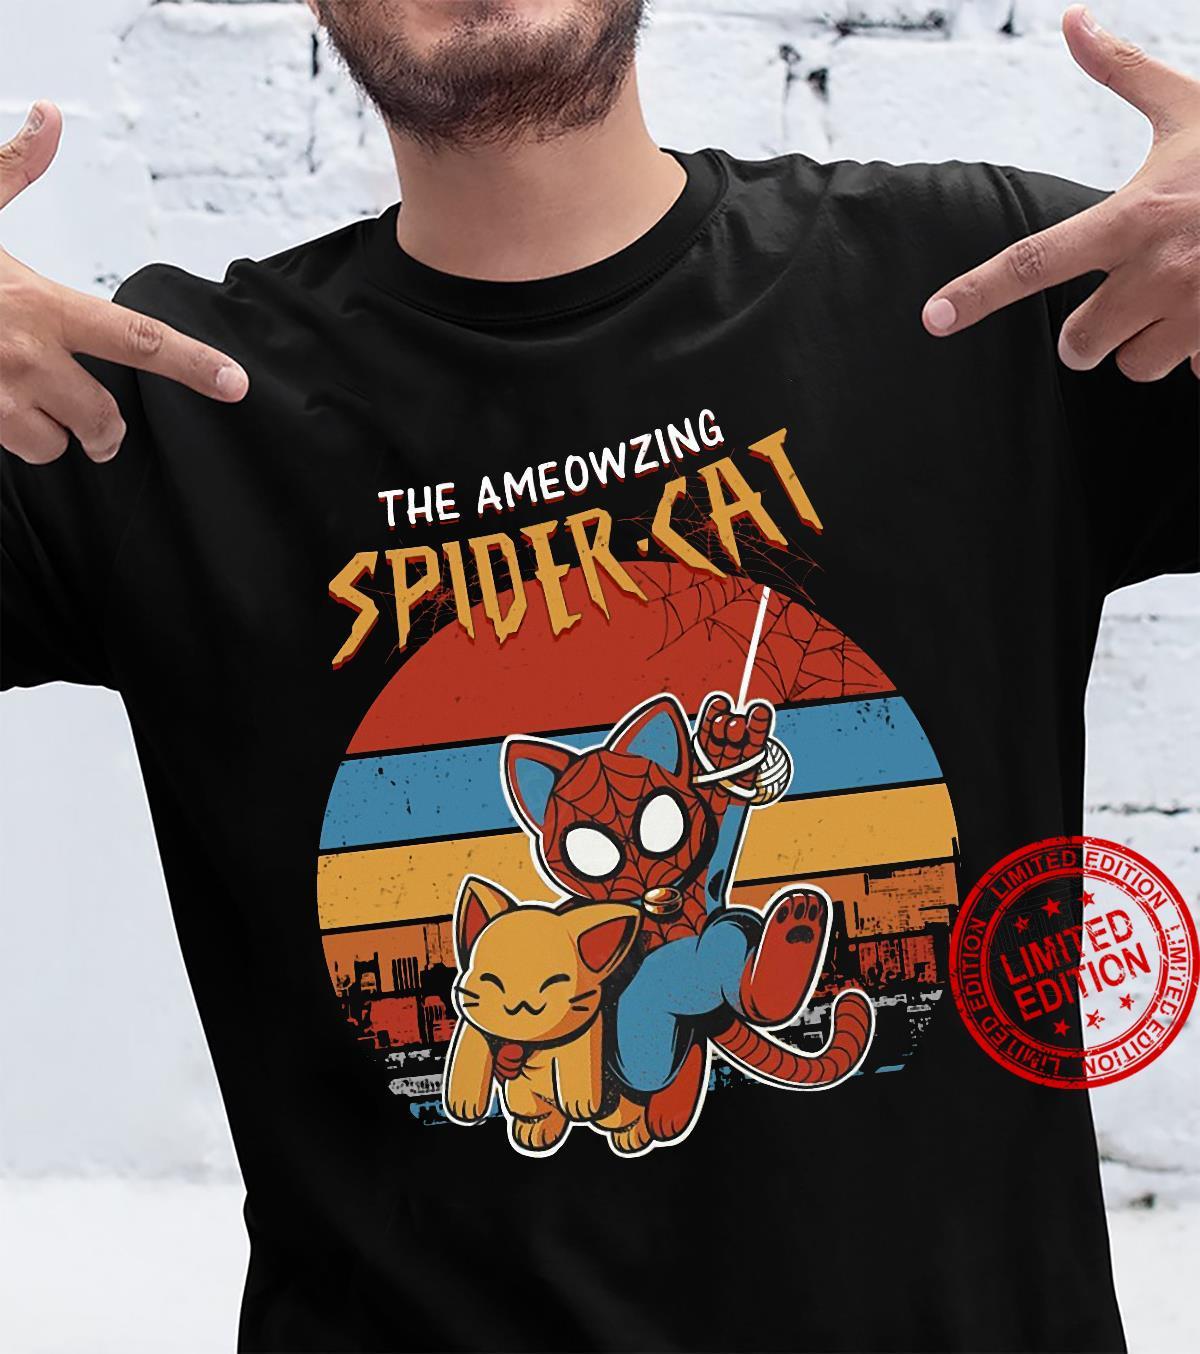 The ameowzing Spider cat shirt